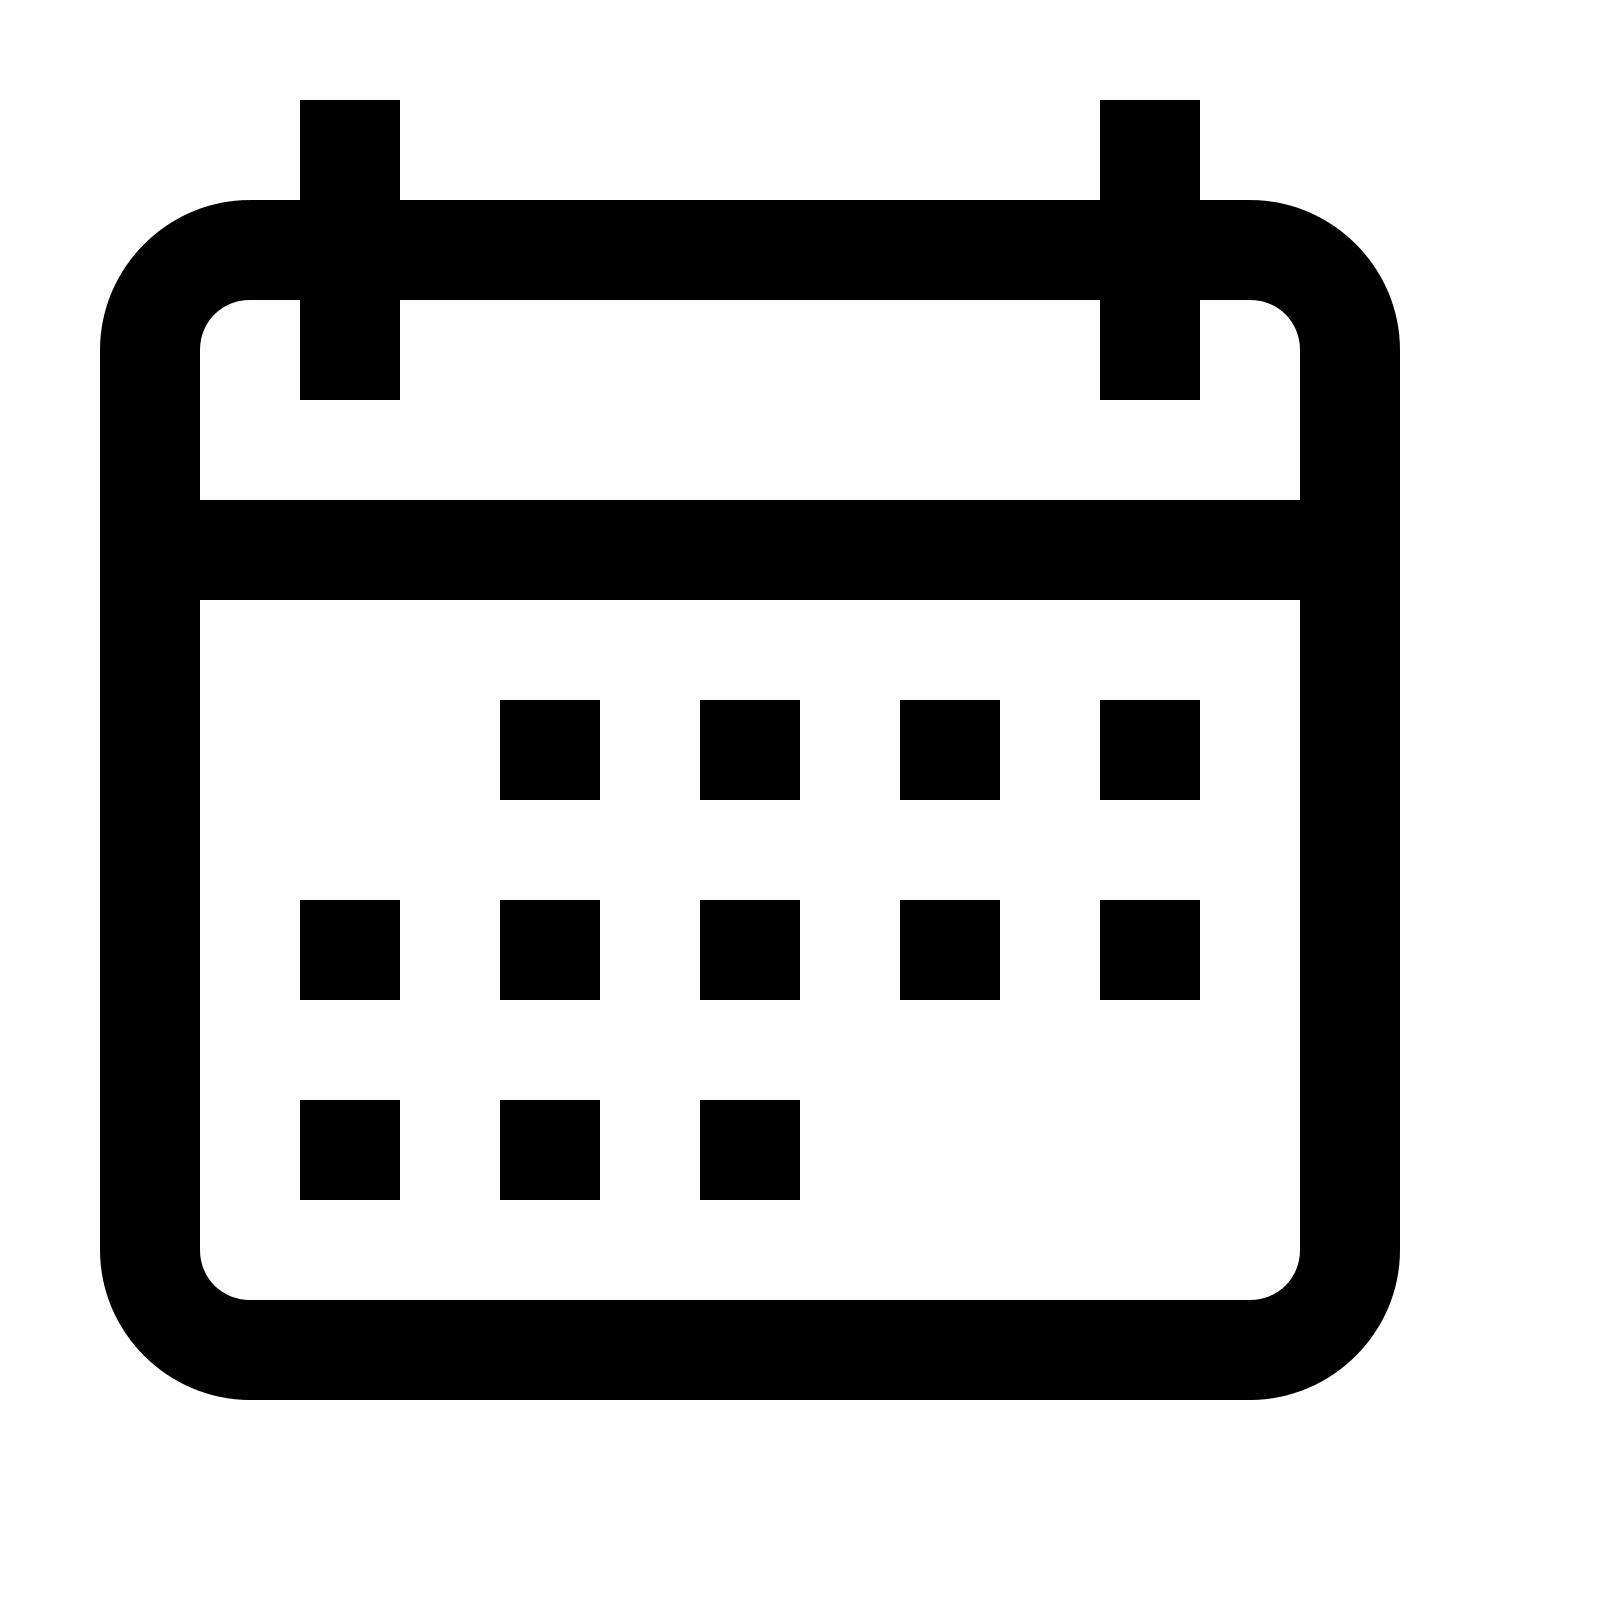 Calendar Icon #17828 - Free Icons Library_Calendar Icon Png 24X24